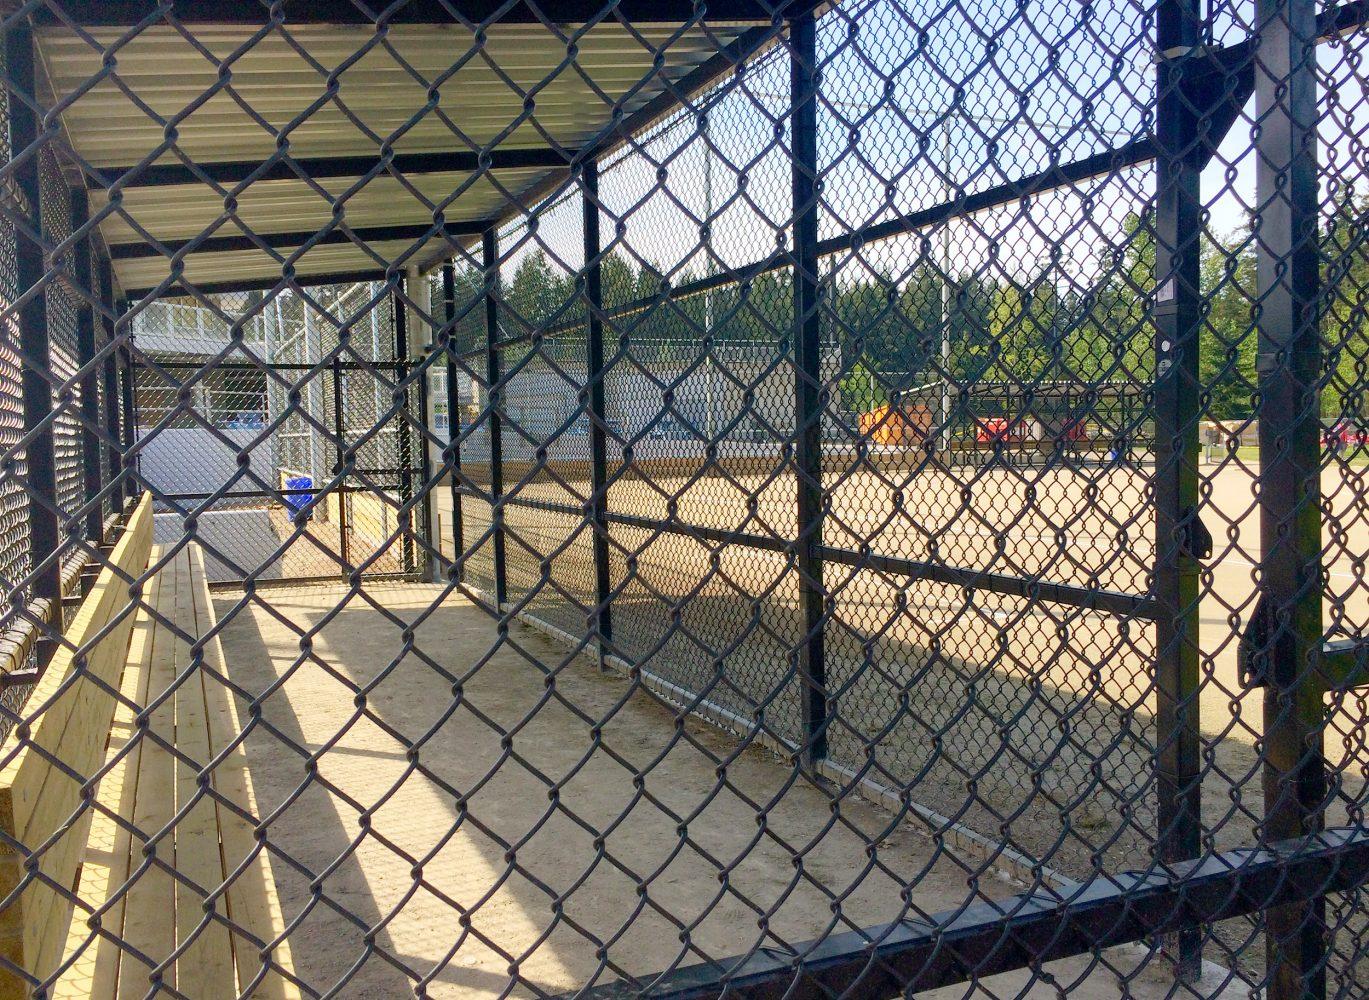 Softball City